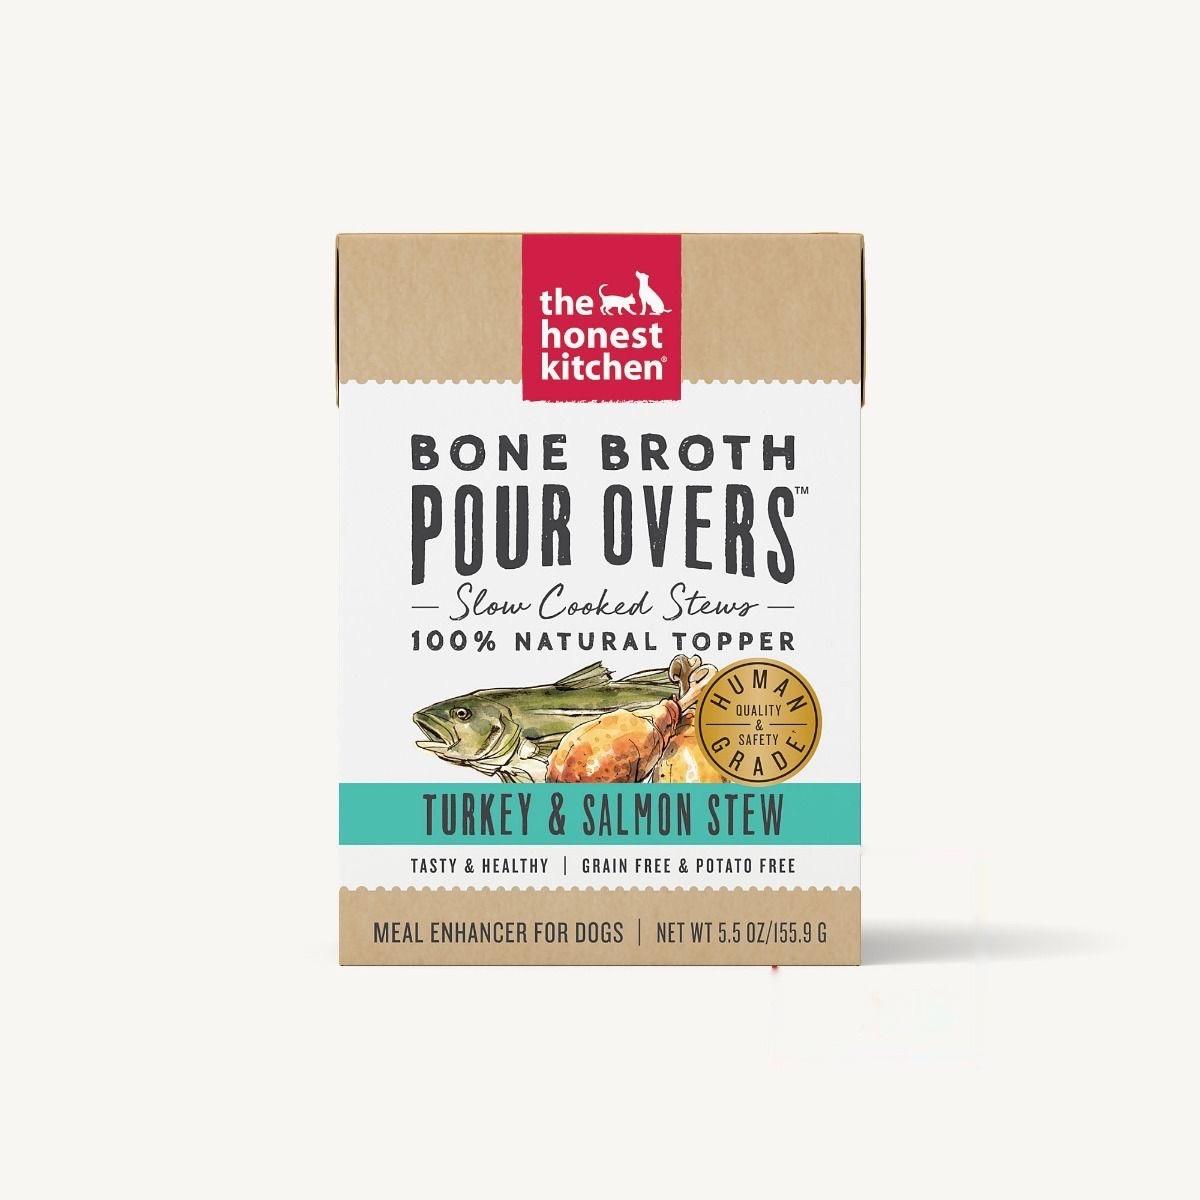 The Honest Kitchen Honest Kitchen Bone Broth Pour Overs Turkey & Salmon Stew 5.5oz Carton